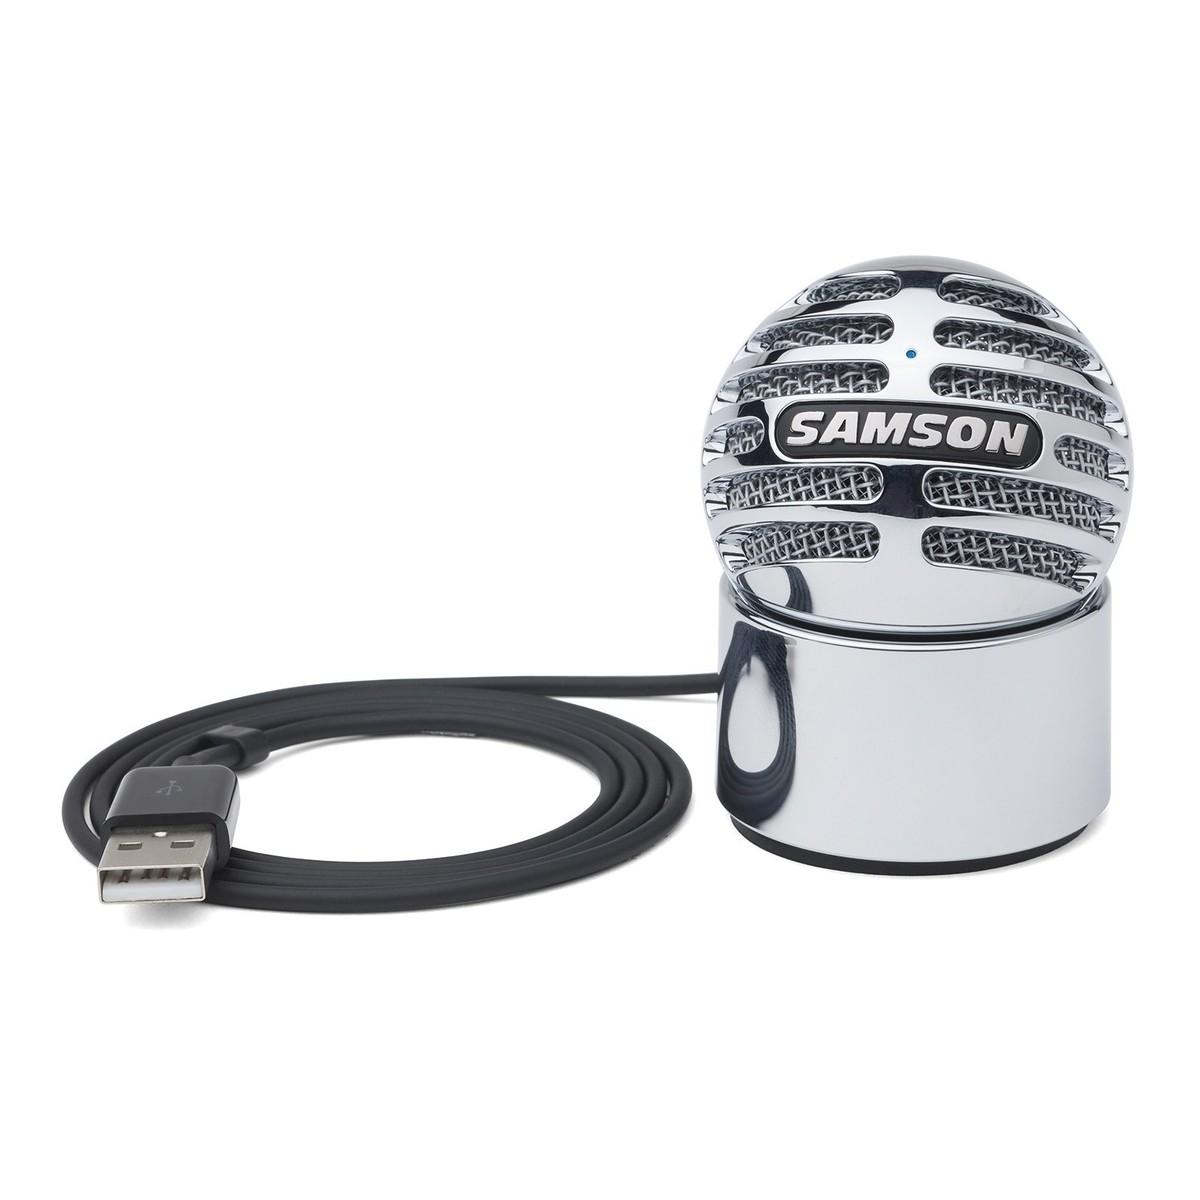 samson meteorite portable usb condenser microphone at gear4music. Black Bedroom Furniture Sets. Home Design Ideas